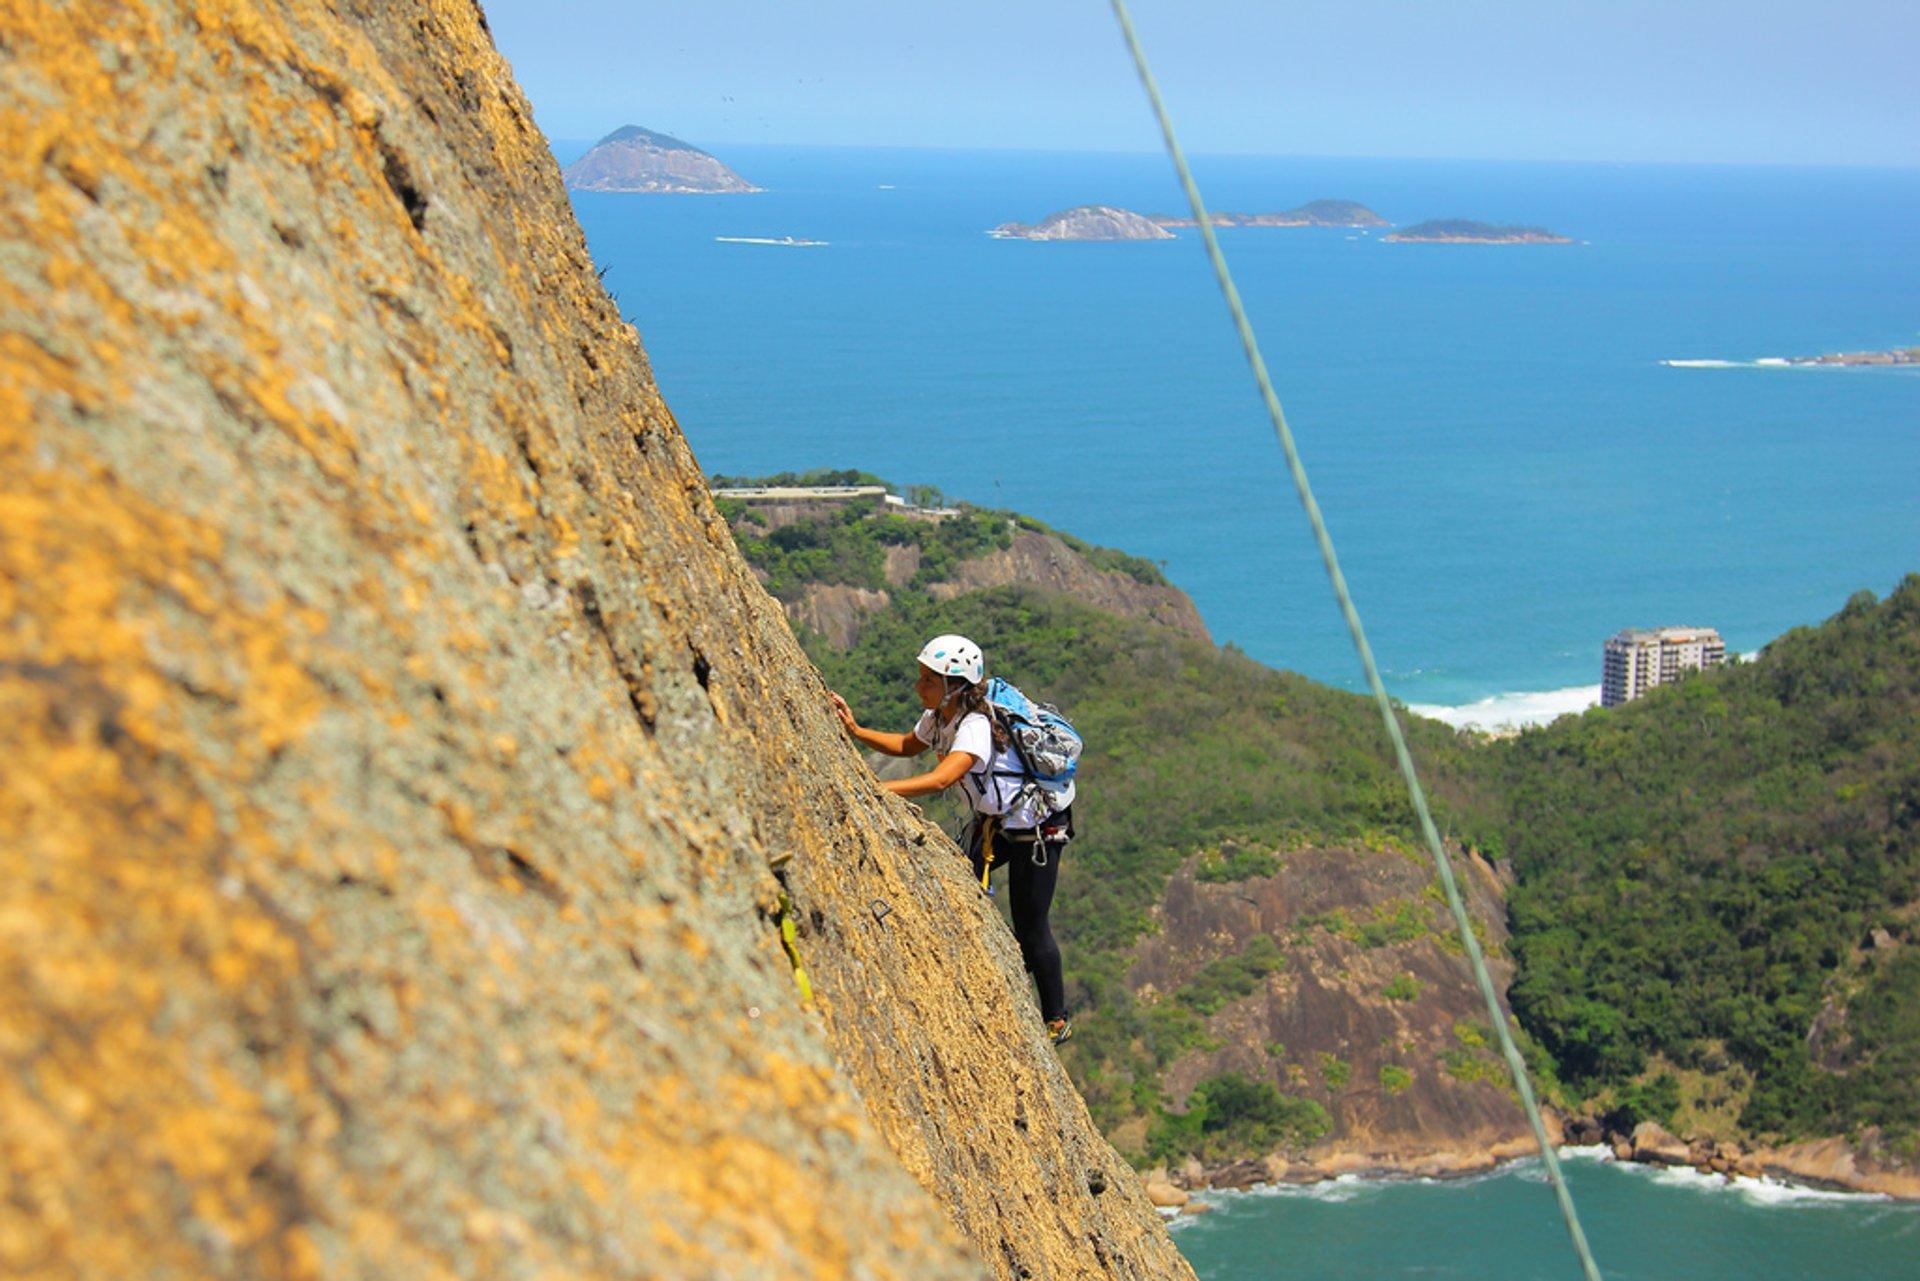 Rock Climbing in Rio de Janeiro 2019 - Best Time